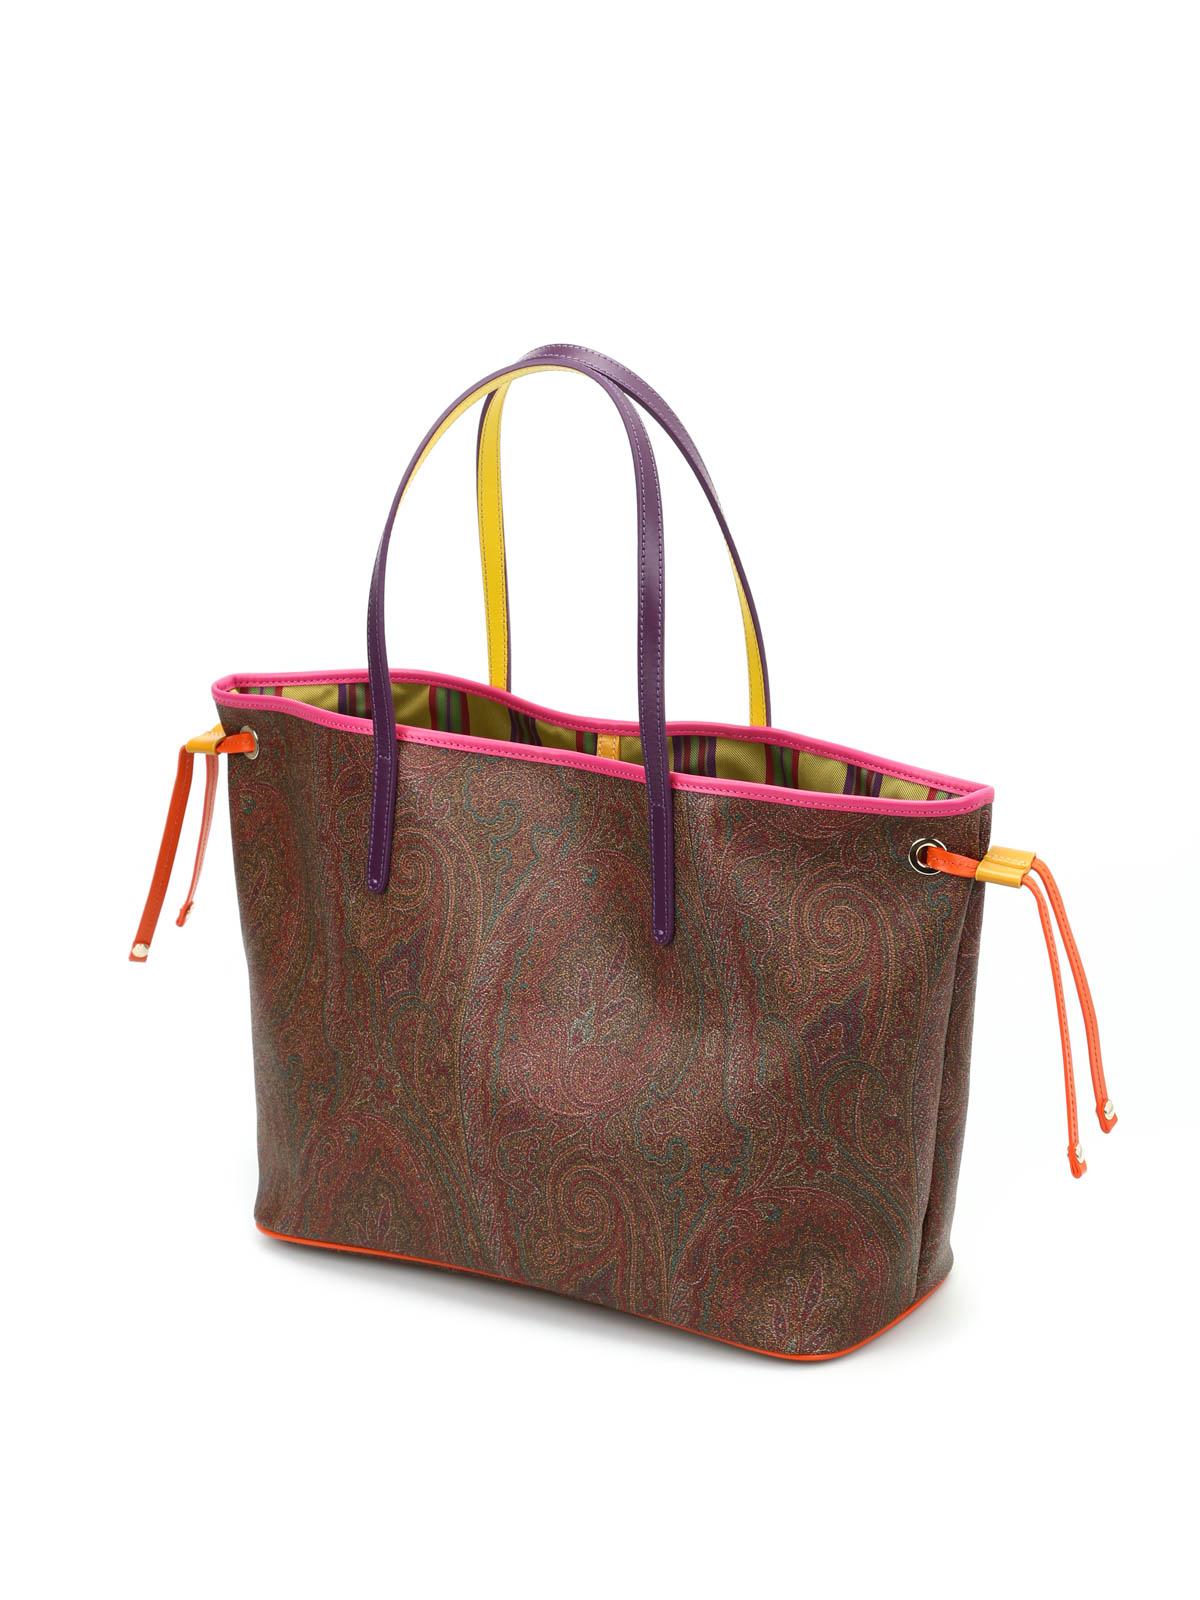 Etro 1310 Bolsos Bolso 601 Shopping 0b374 Tote Multicolor Pn08kwO